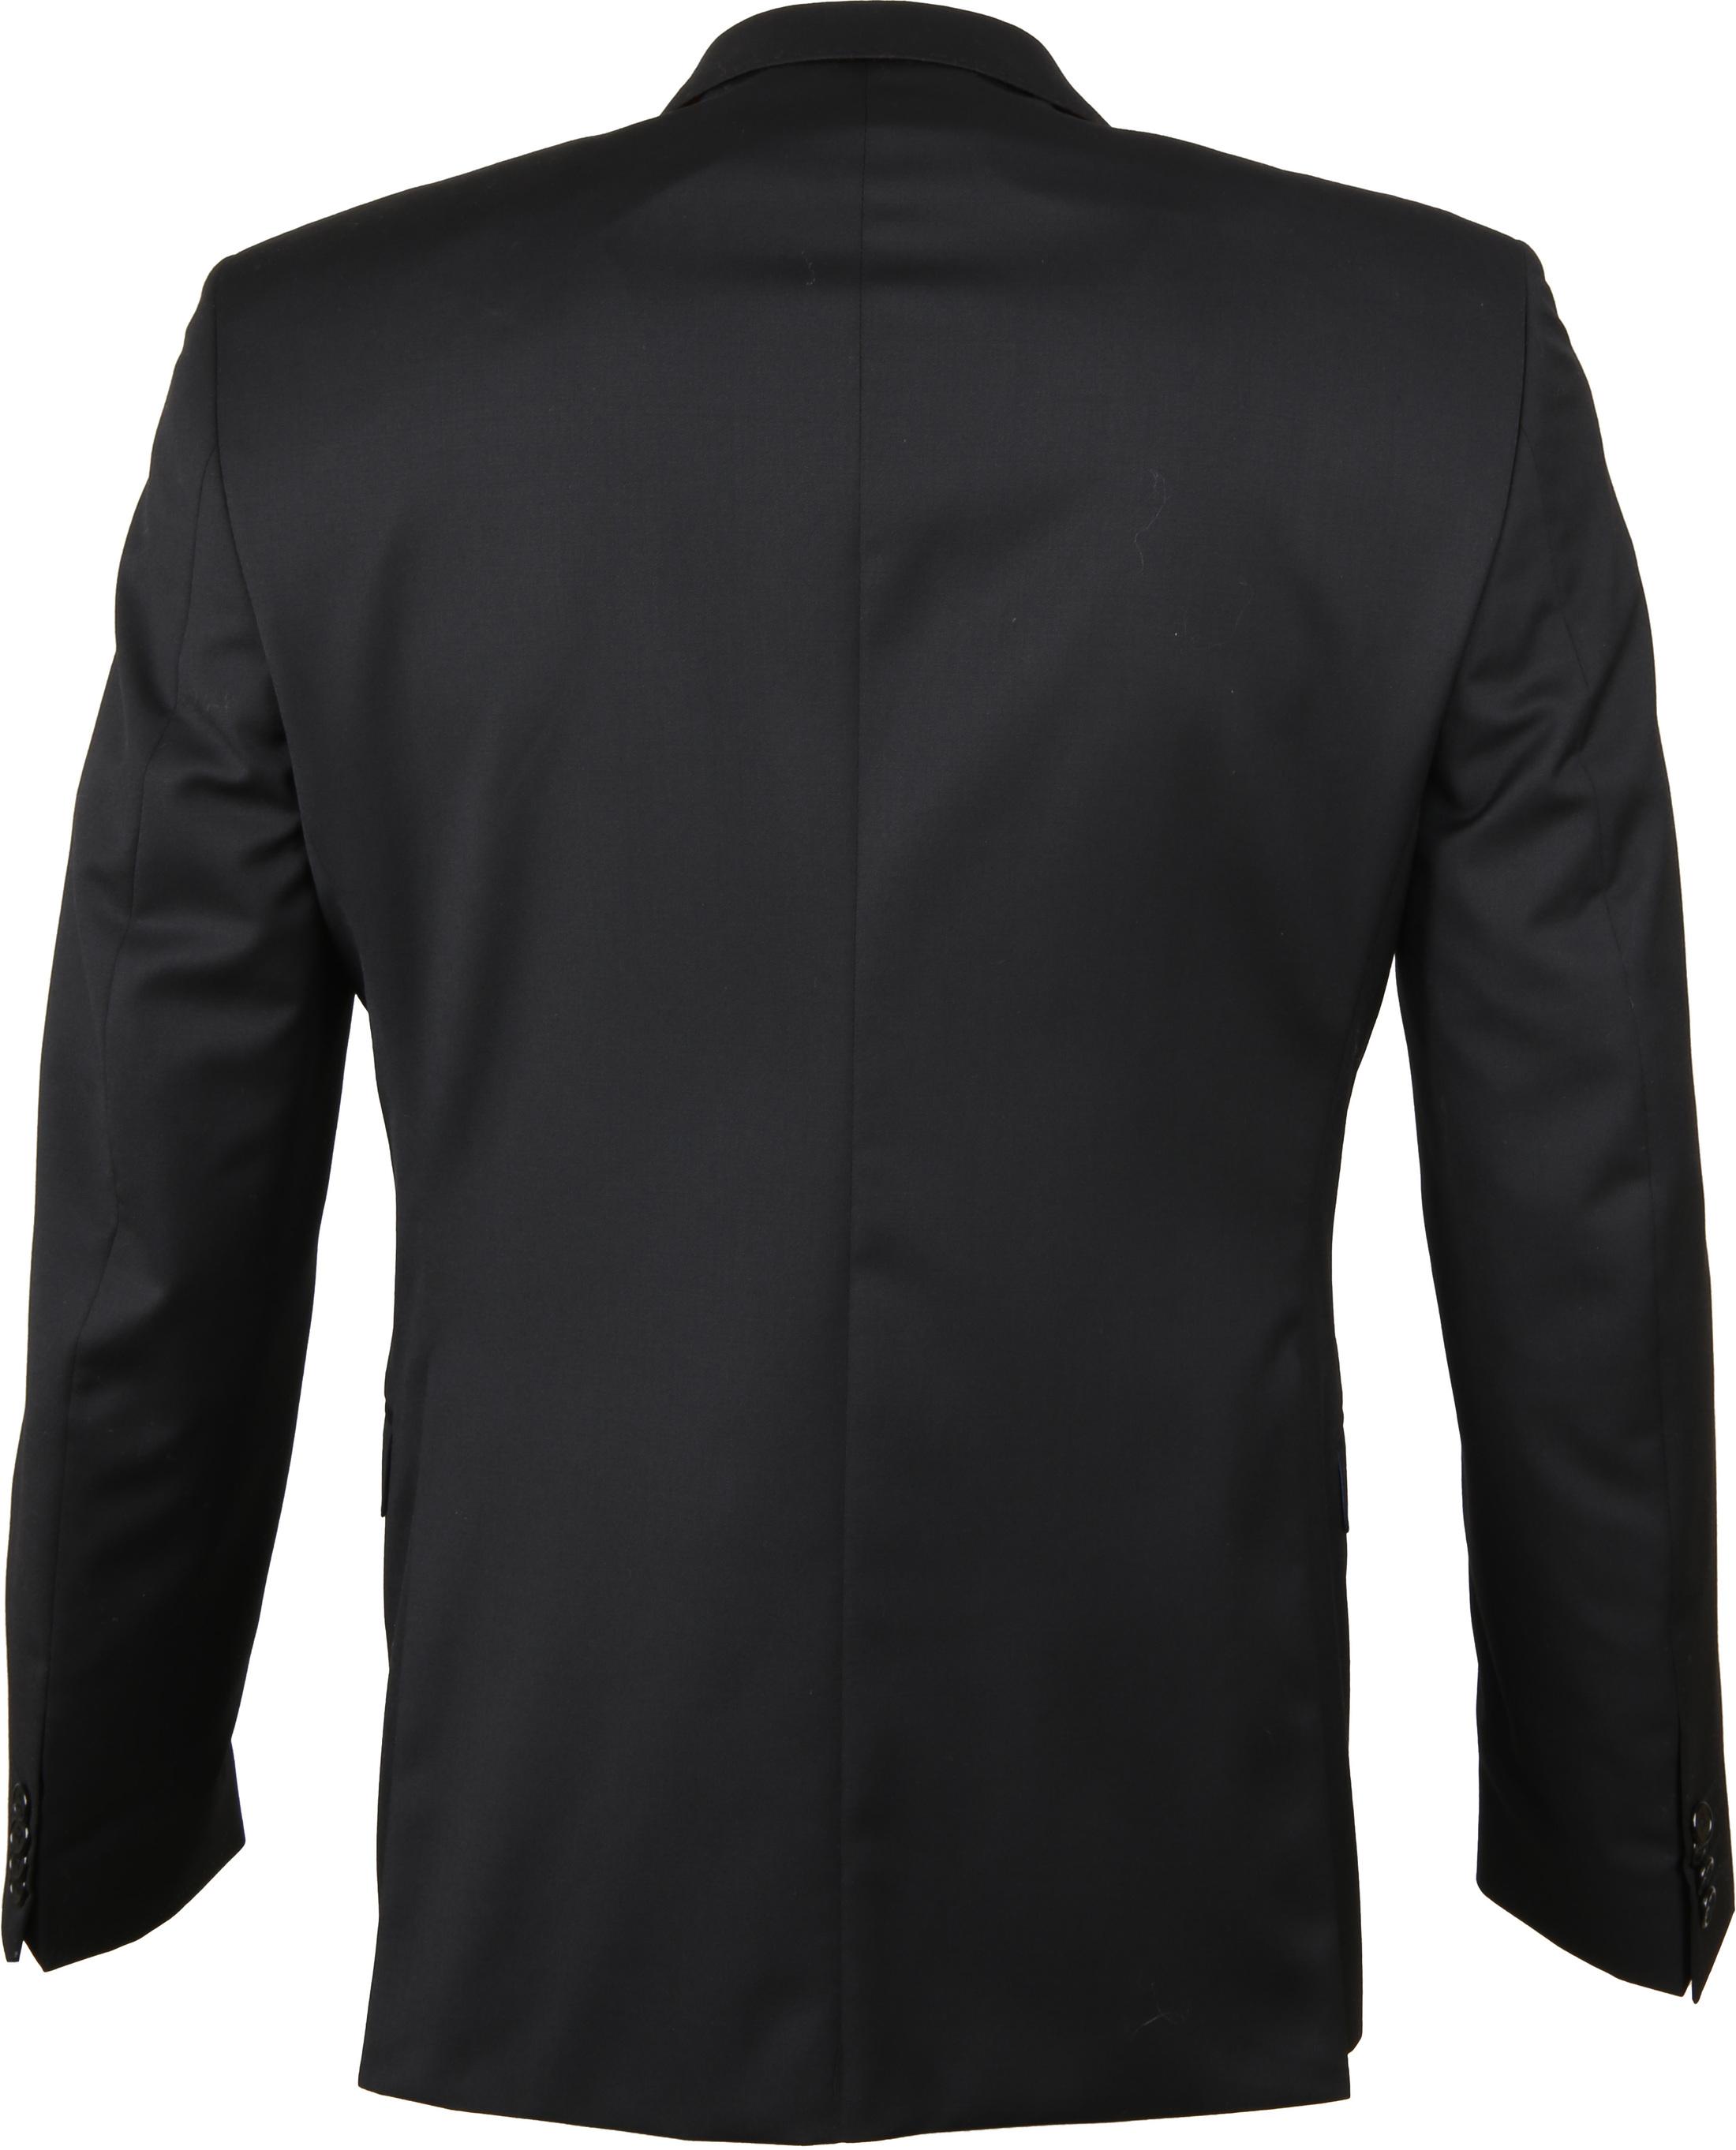 Suitable Blazer Piga Black foto 3